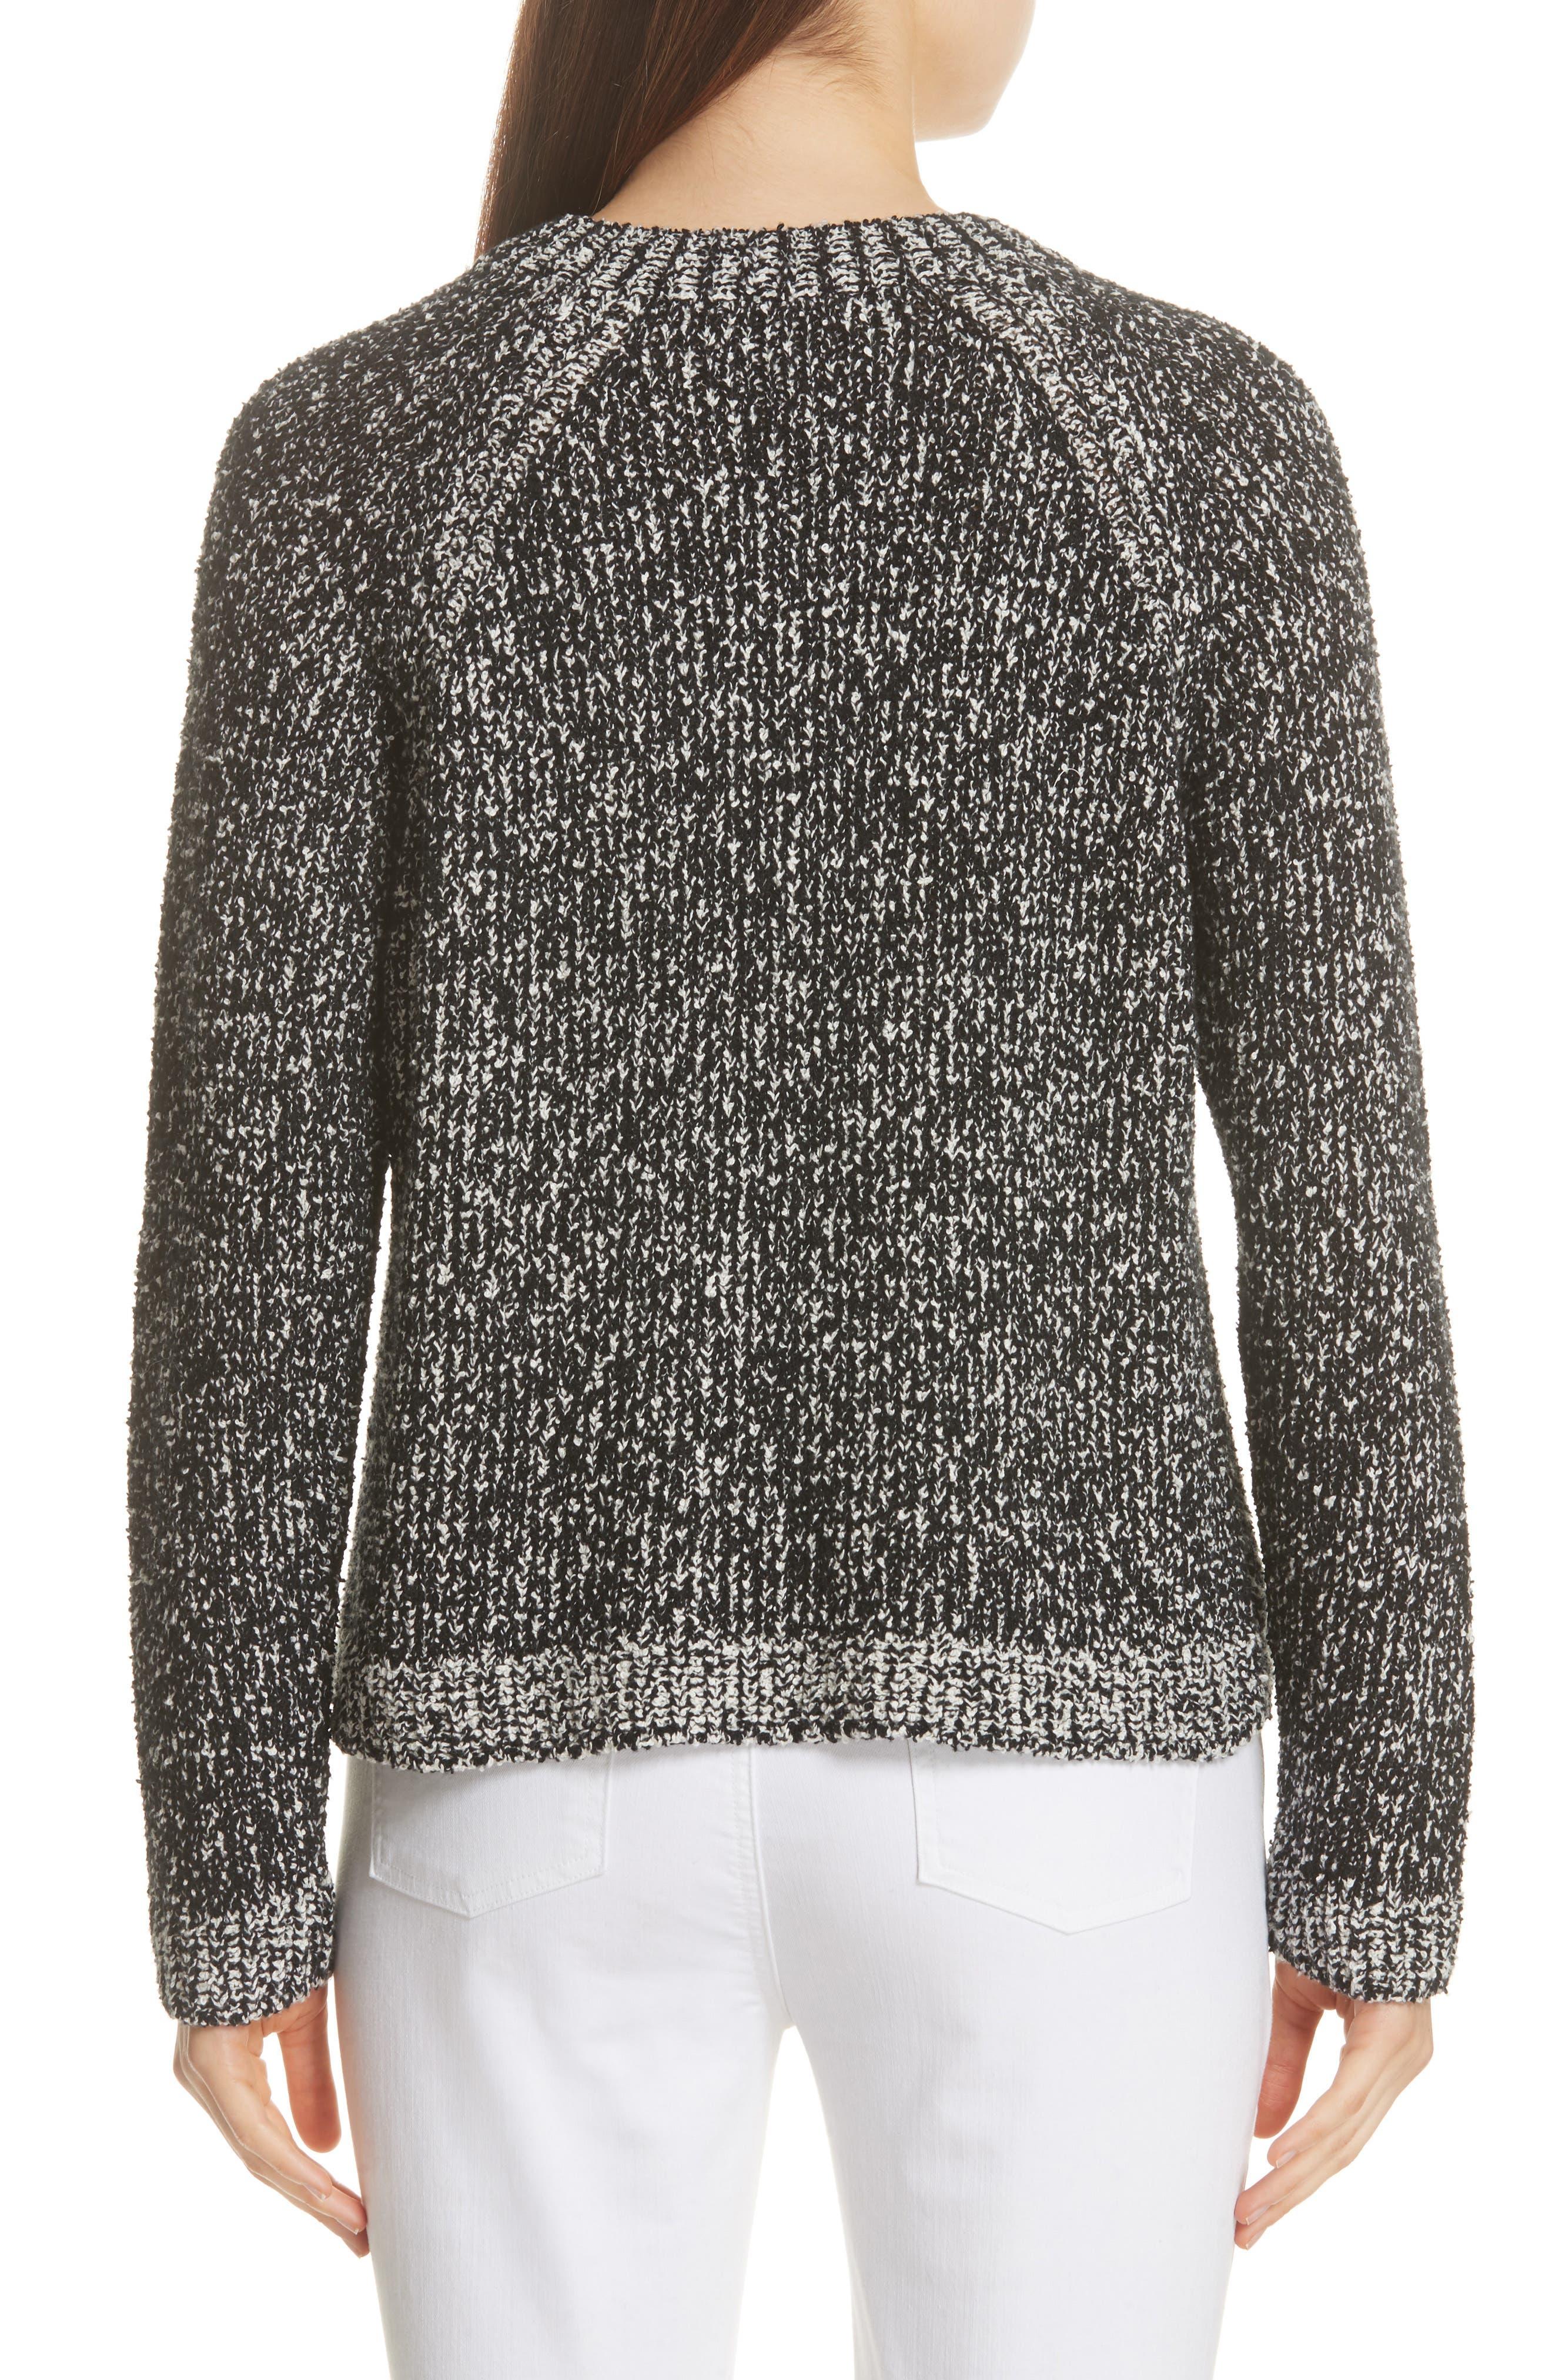 Round Neck Boxy Sweater,                             Alternate thumbnail 2, color,                             BLACK/ SOFT WHITE